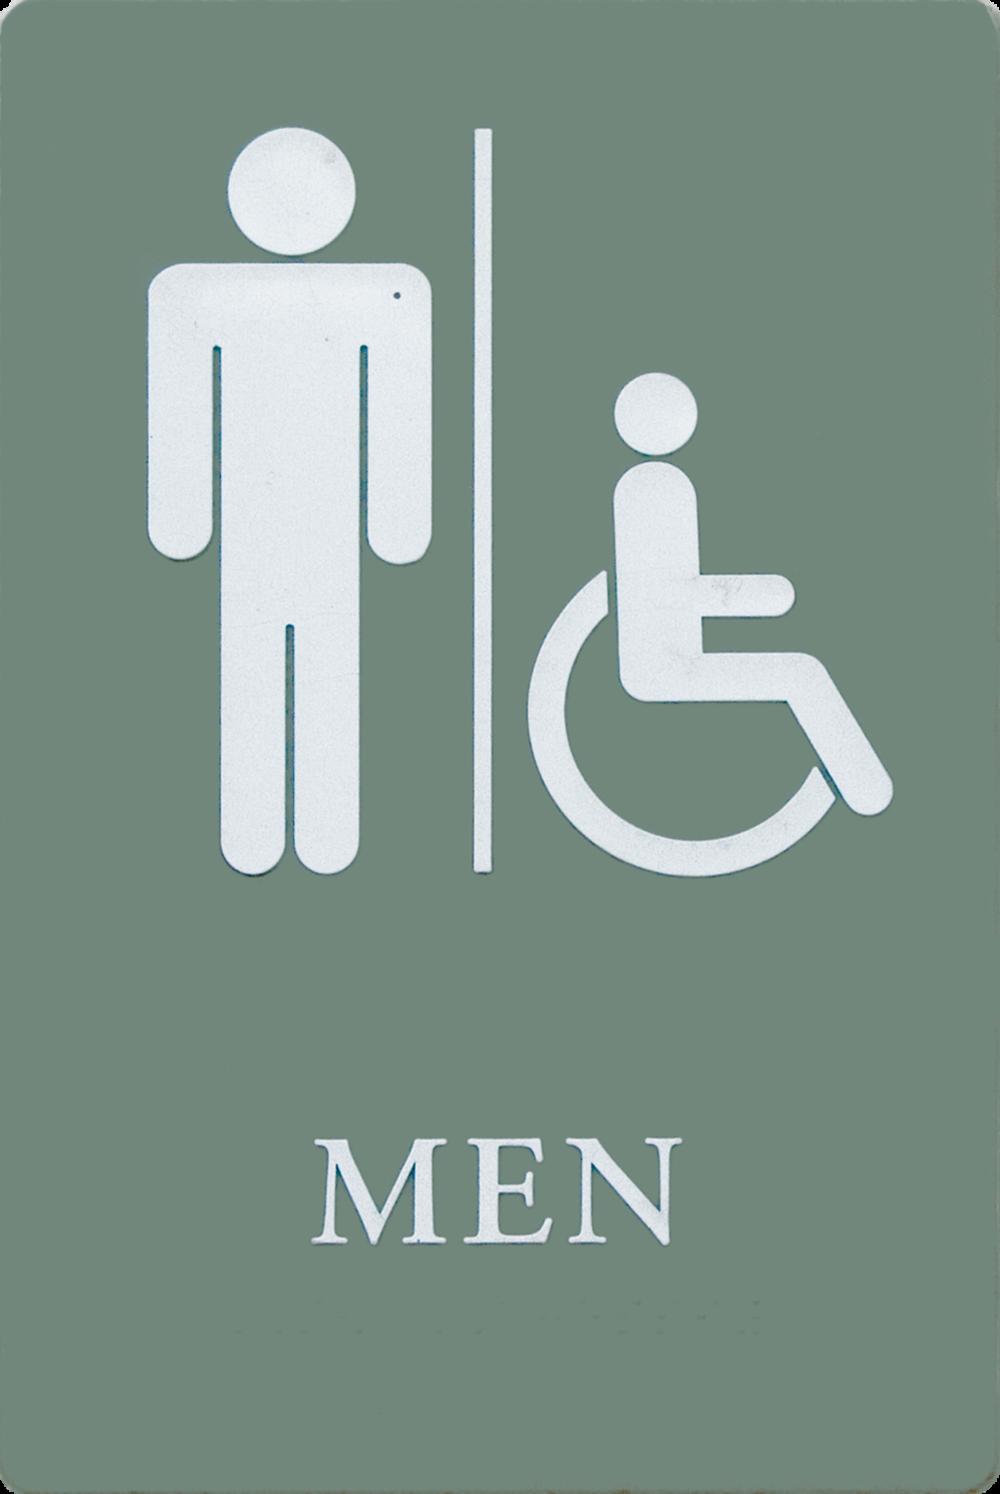 Mens Restroom Green.png